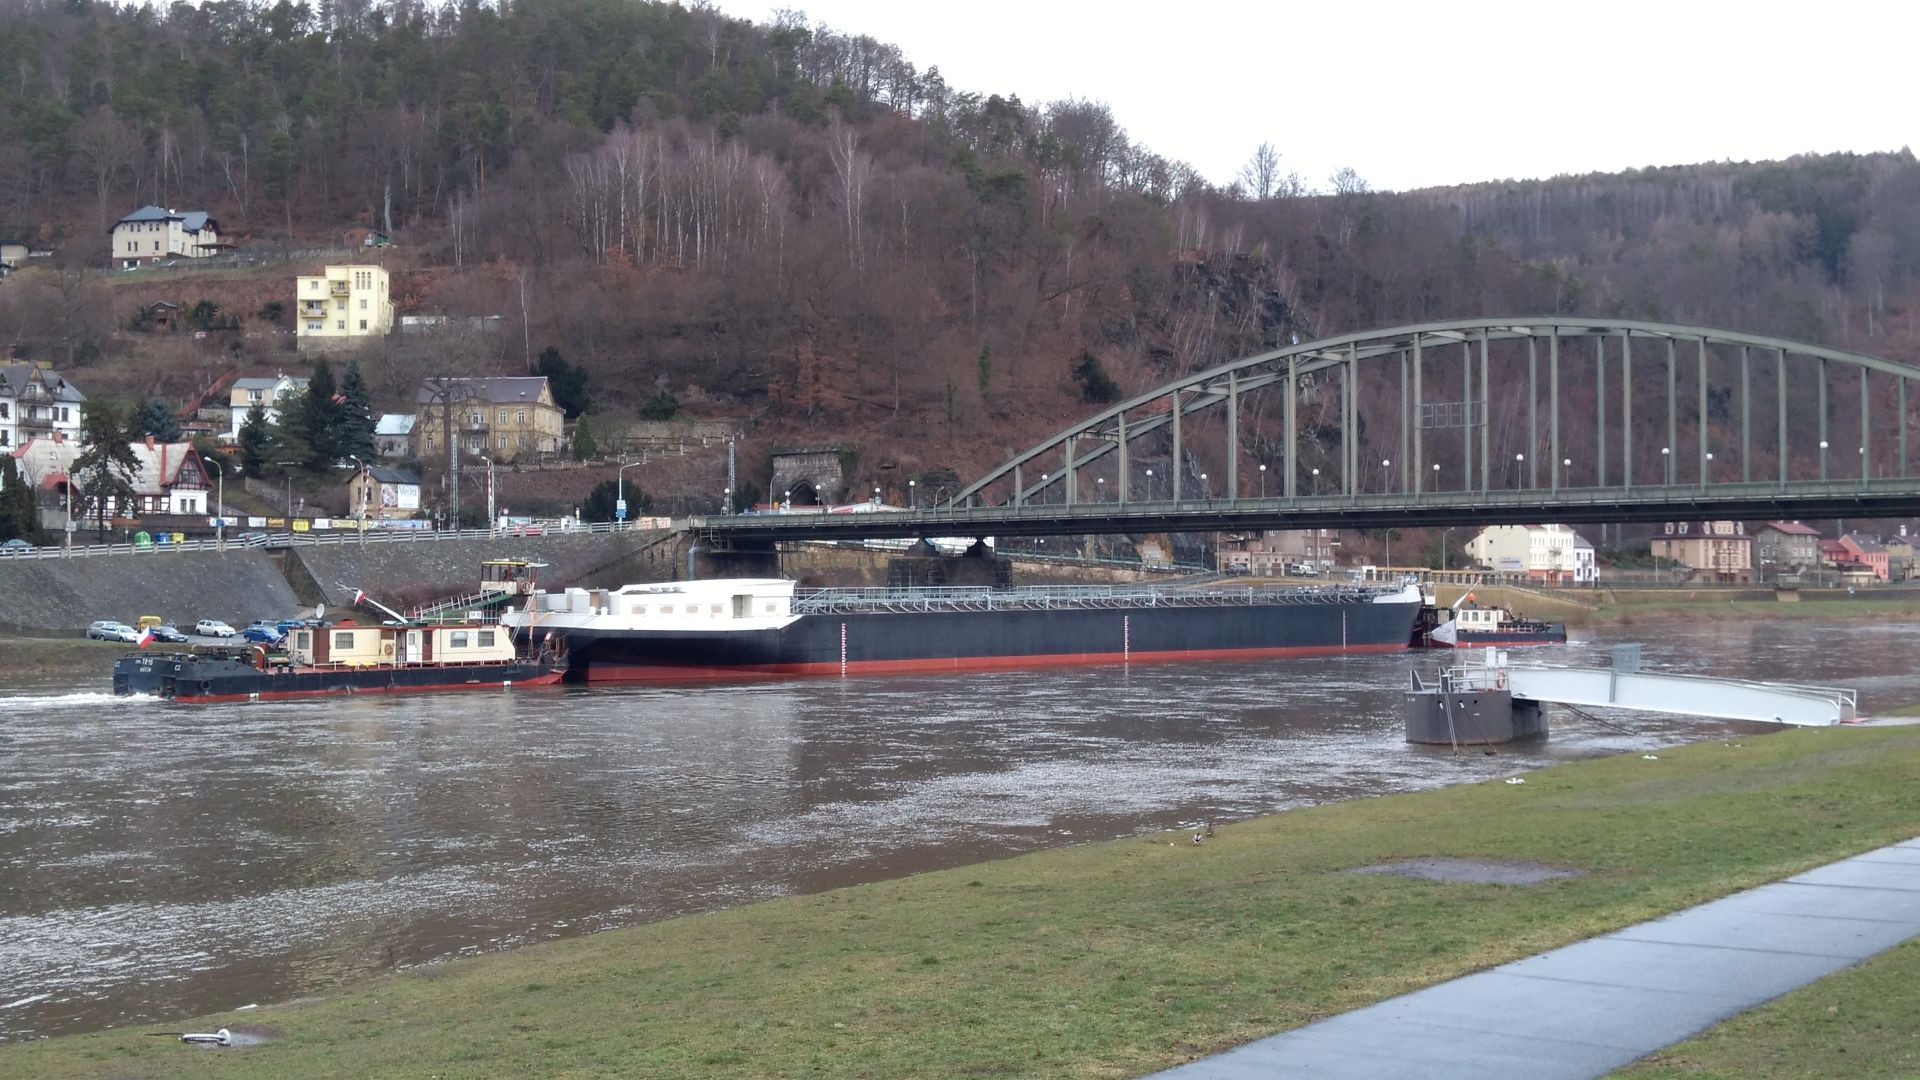 Nový tanker v Děčíně. Autor: Jaroslav Pokorný